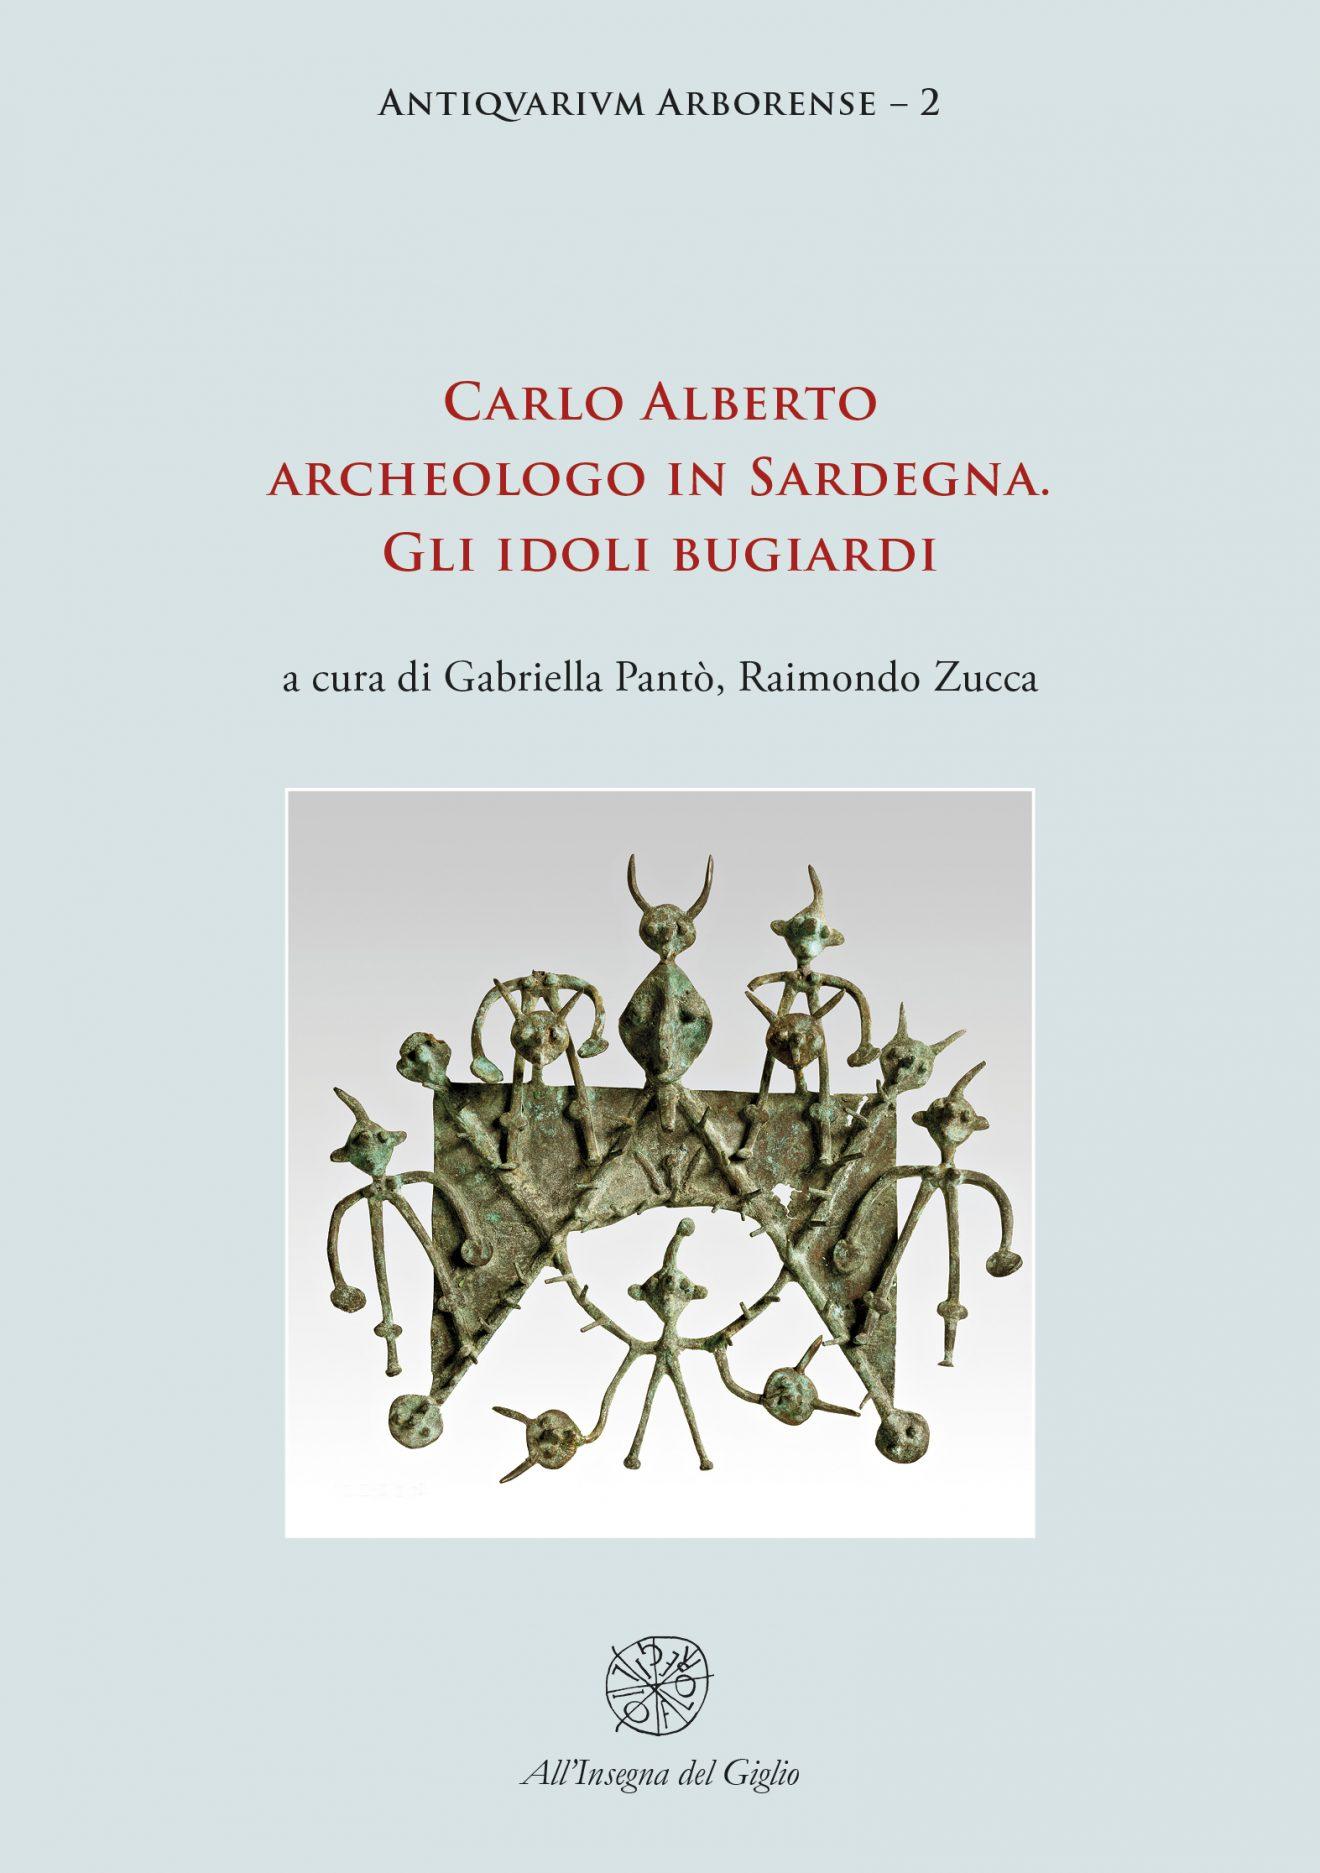 Carlo Alberto archeologo in Sardegna. Gli idoli bugiardi